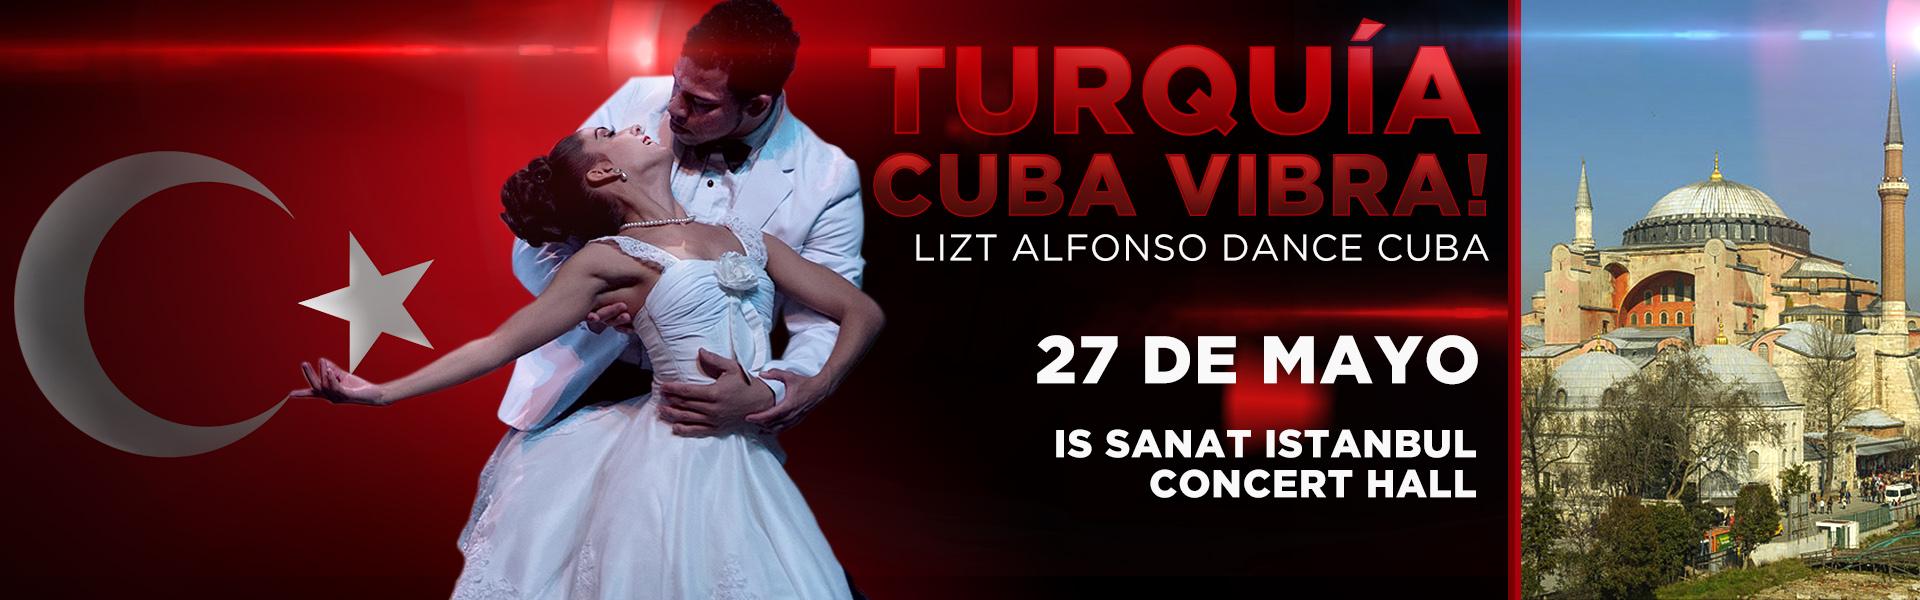 TURQUIA-CUBA-VIBRA